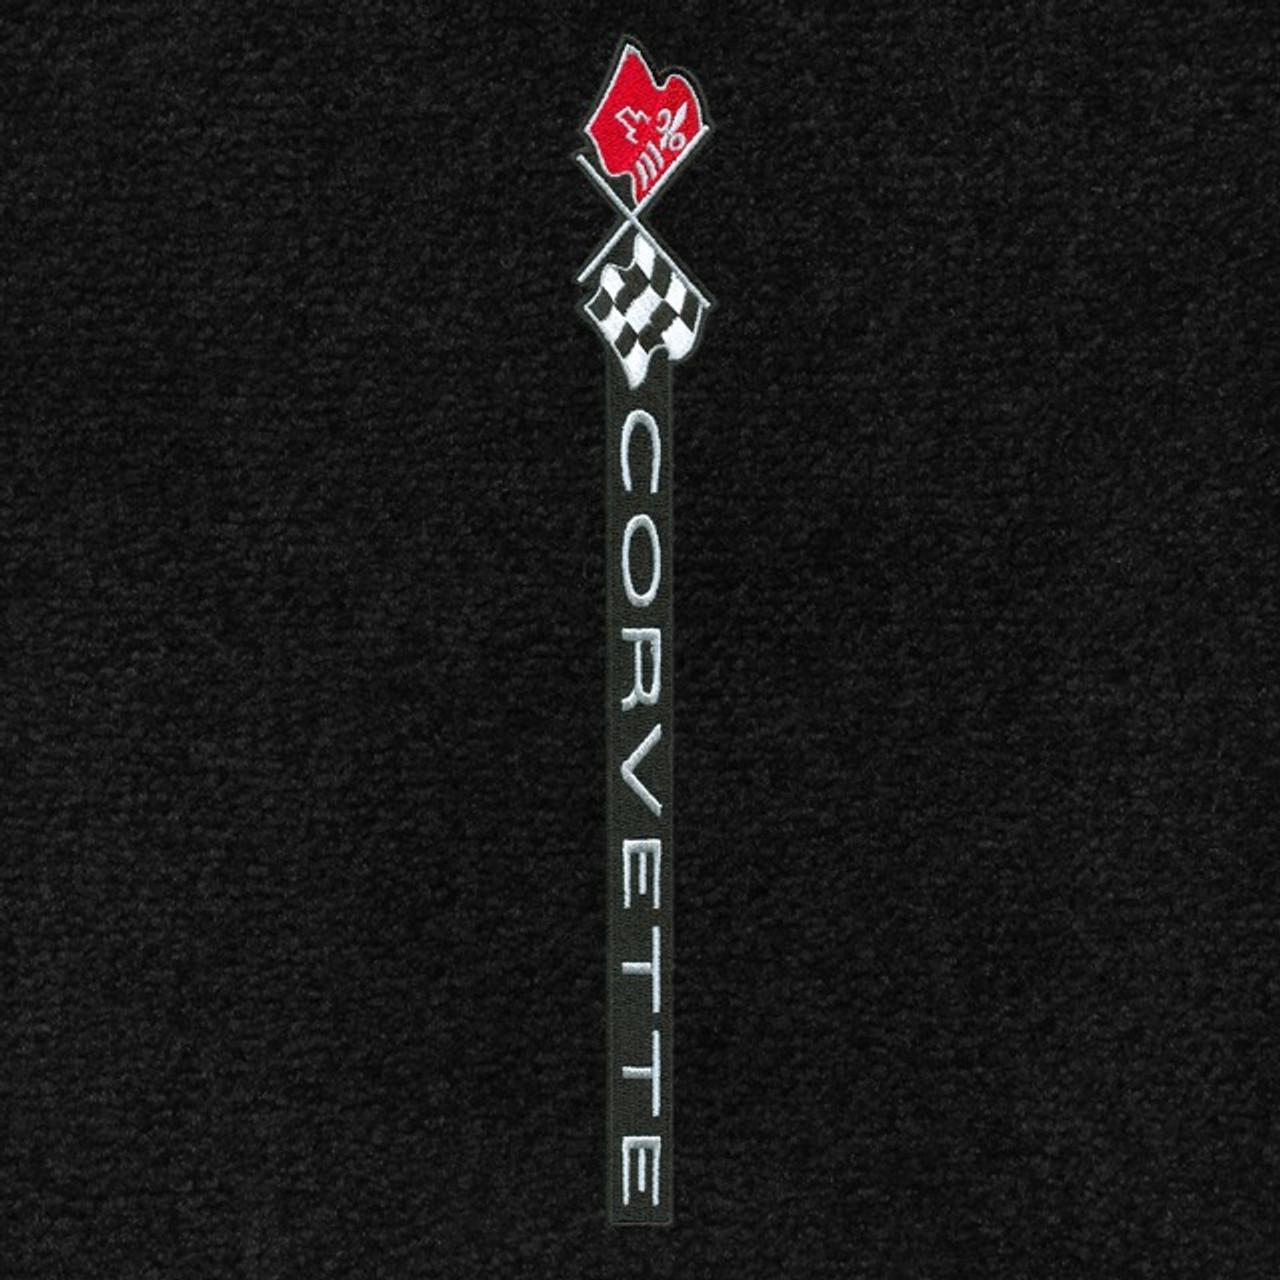 1968-1982 Corvette Logo/Lettering Sideways (facing door sill)